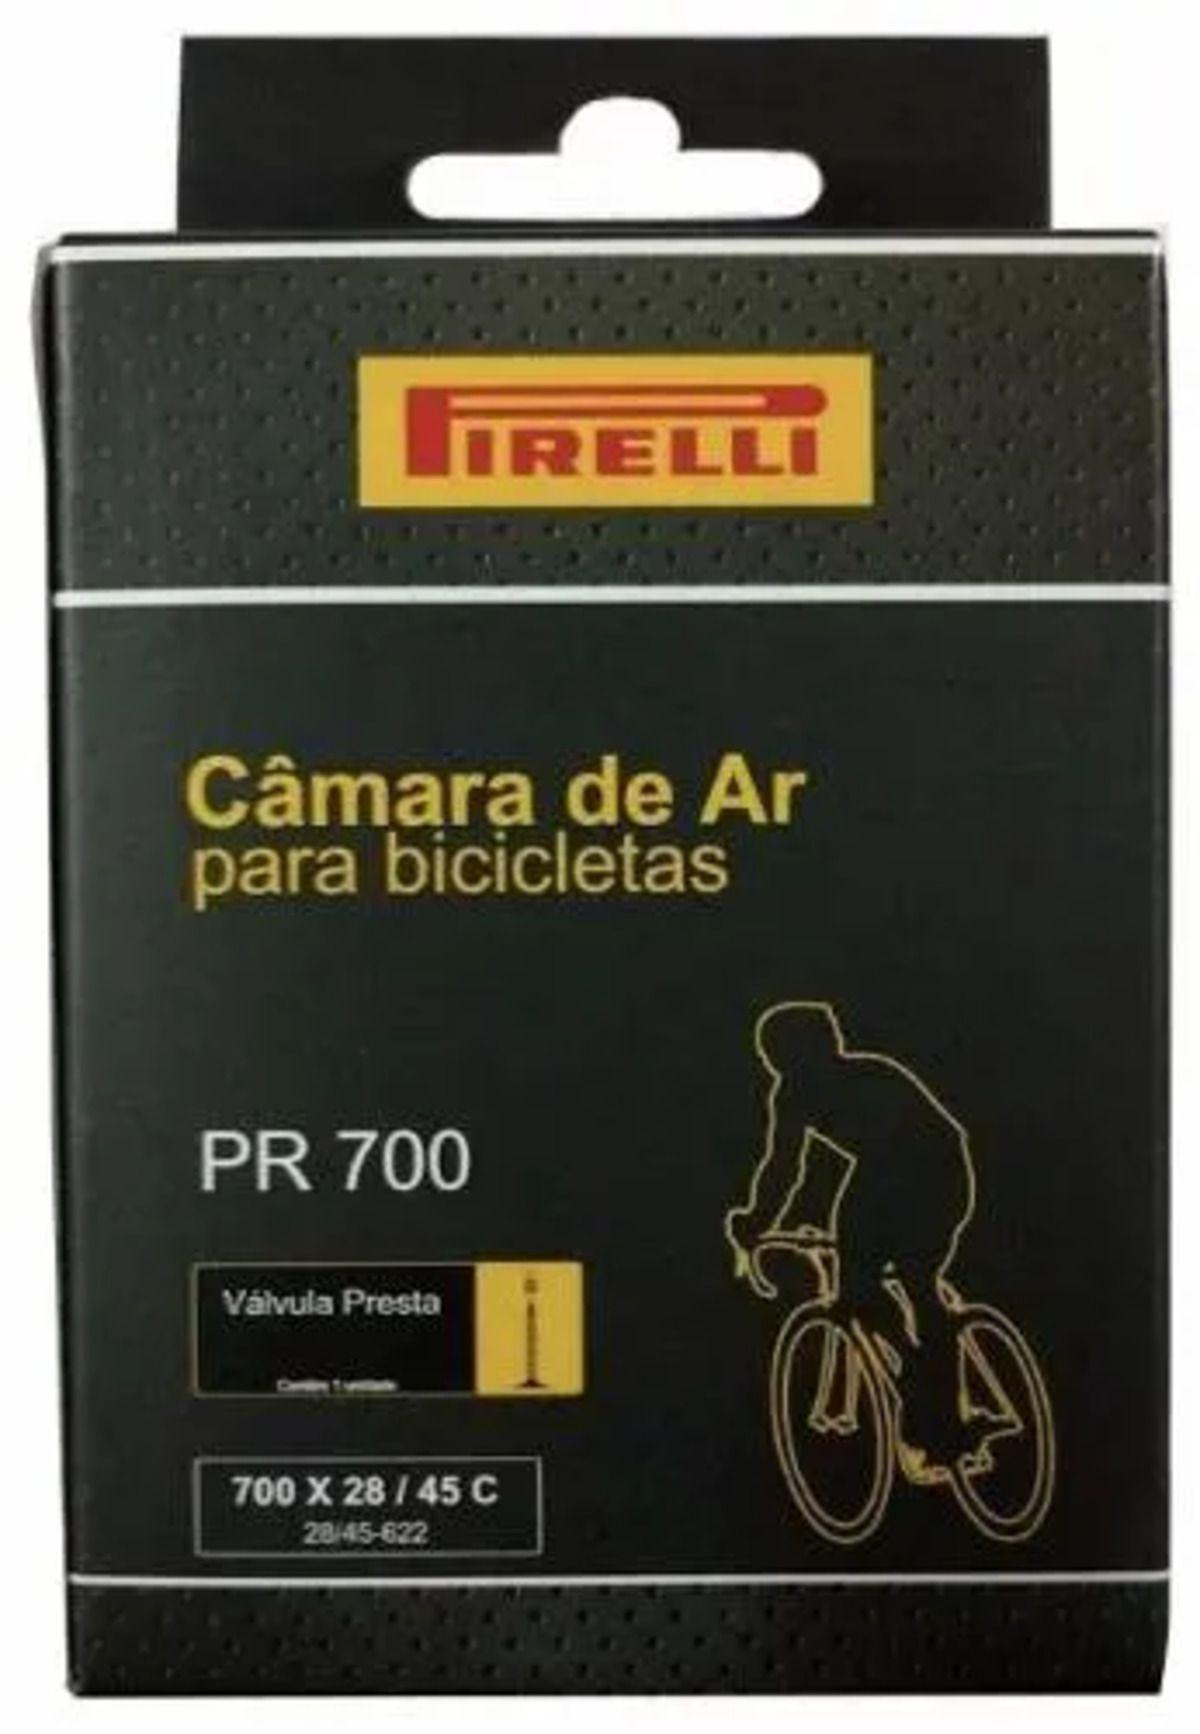 Kit Pneu Pirelli Phantom Street 700x32 Aramado com Câmara Pirelli 700